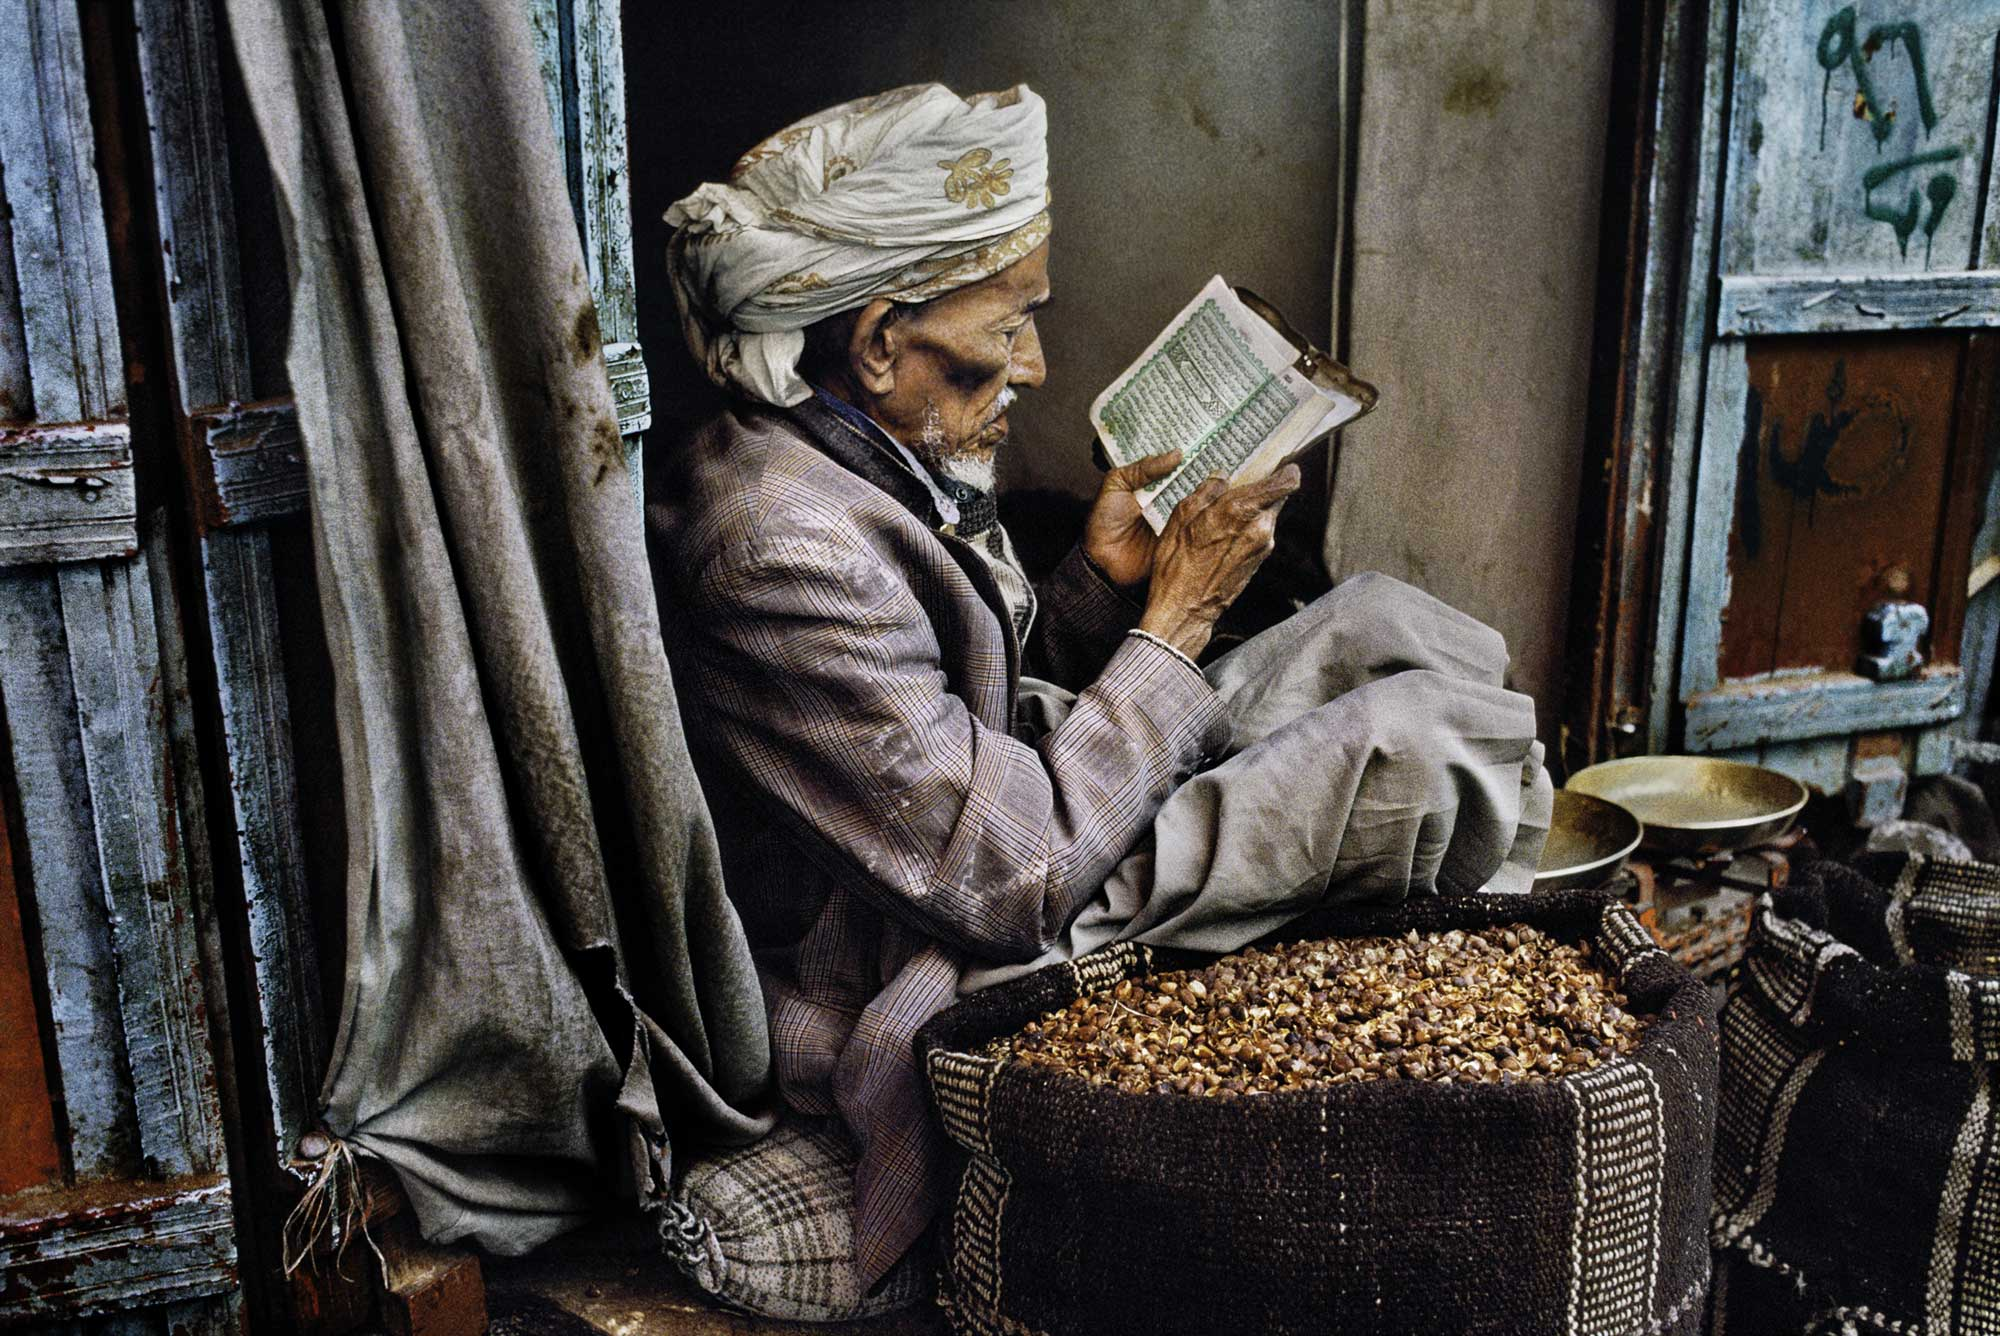 [1] Sana'a, Yemen, 1997 © 2012-2017 Steve McCurry